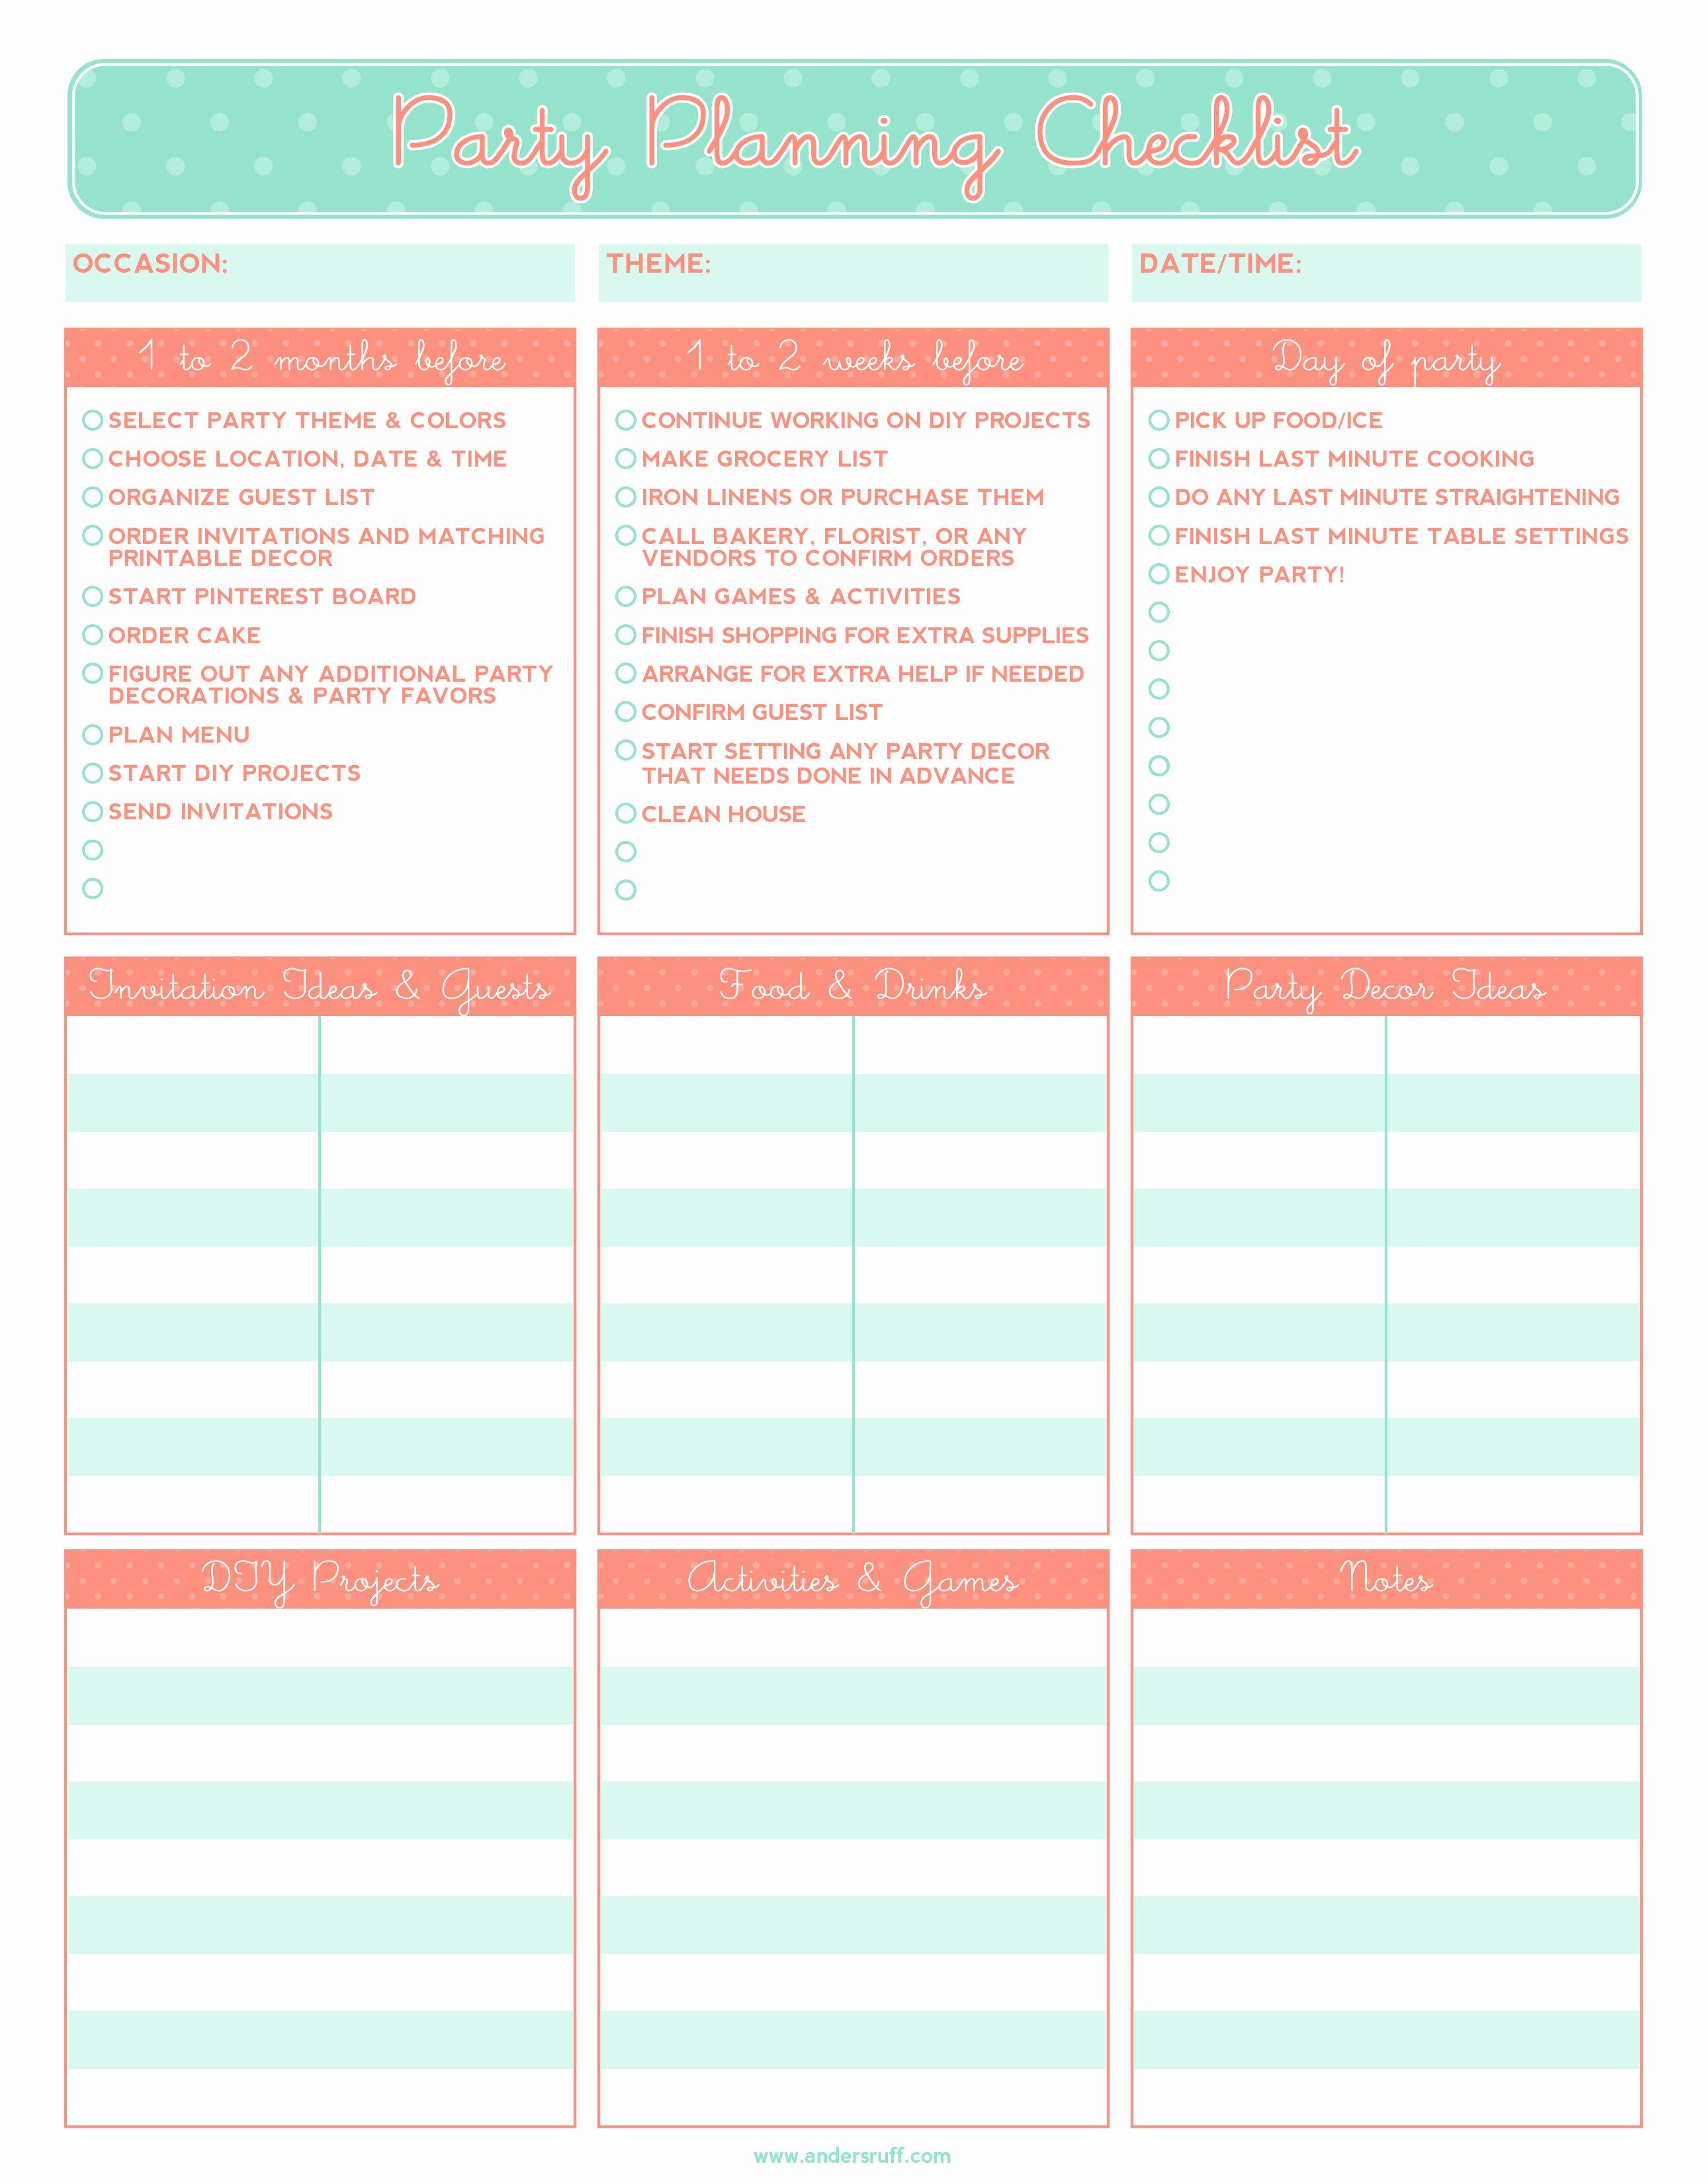 Event Planner Website Template Unique 5 Party Planning Templates Excel Xlts